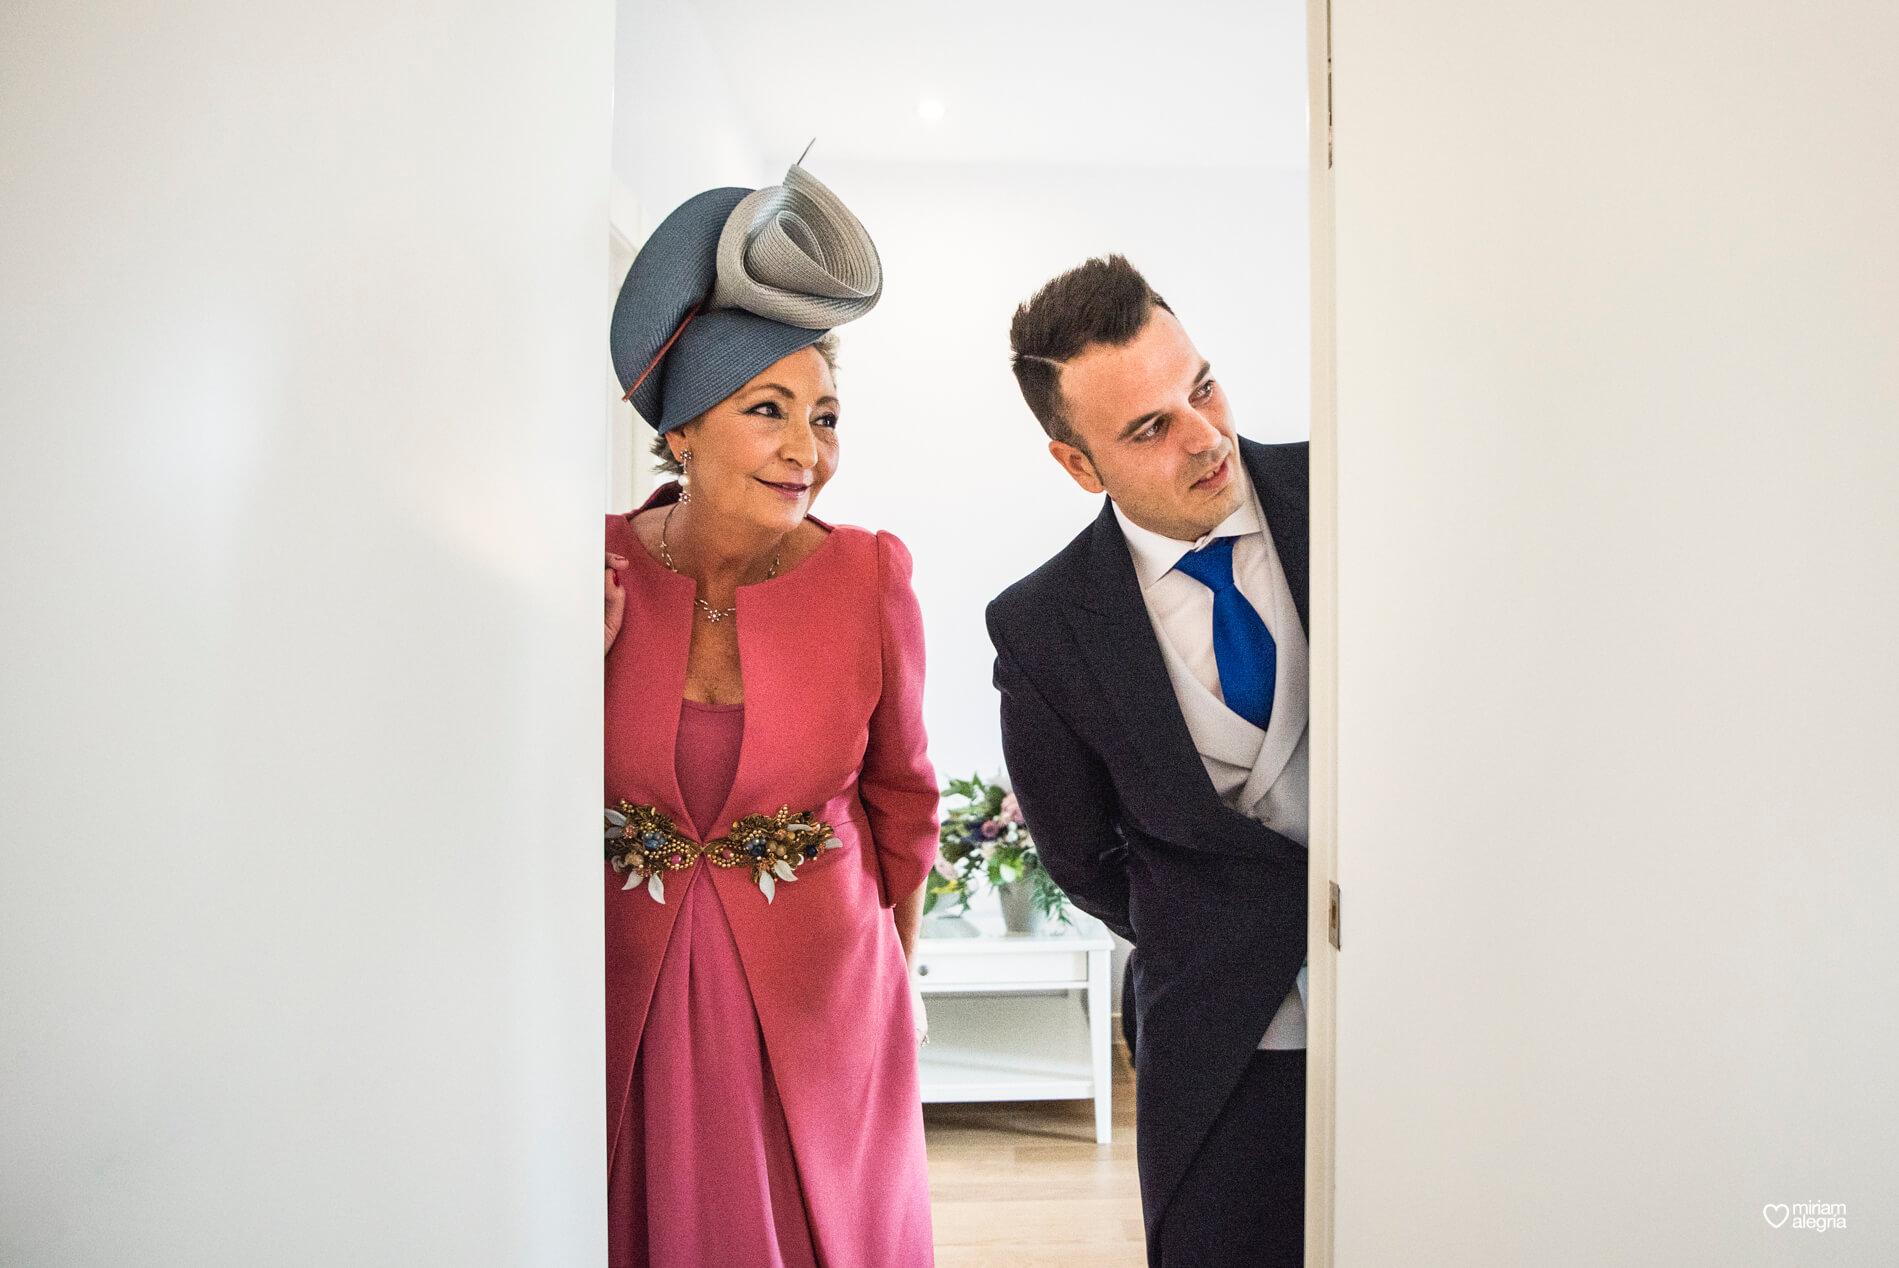 vestido-de-novia-paula-del-vas-miriam-alegria-fotografos-boda-murcia-165